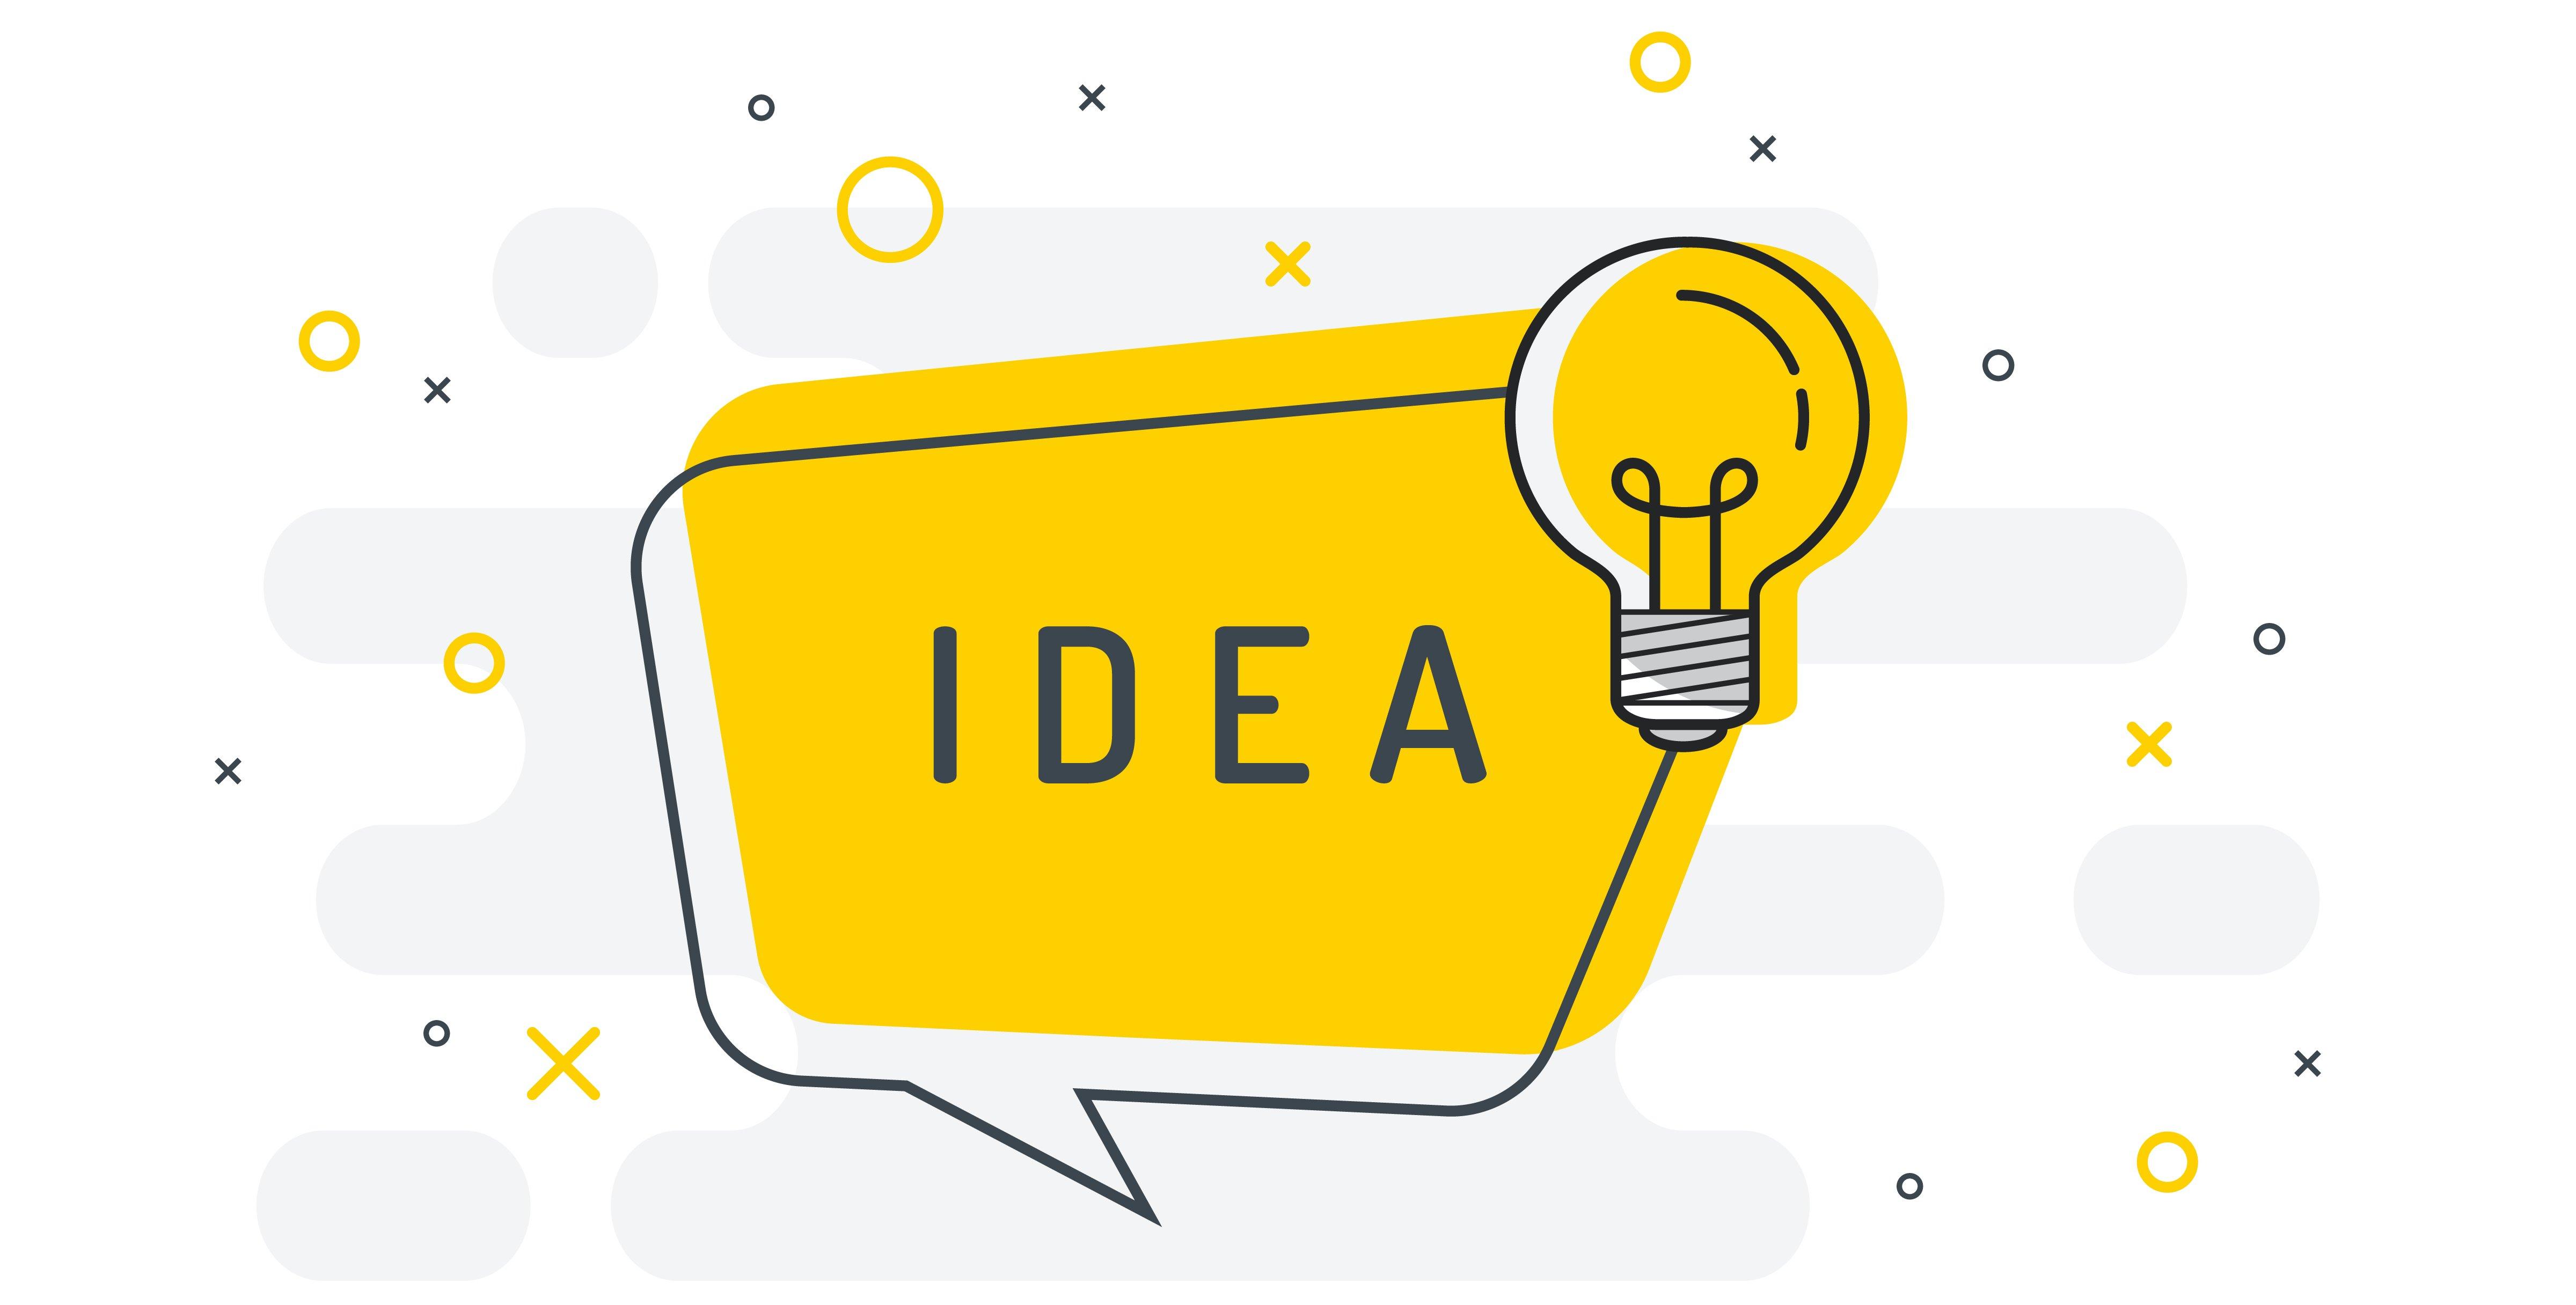 Idea with lightbulb illustration